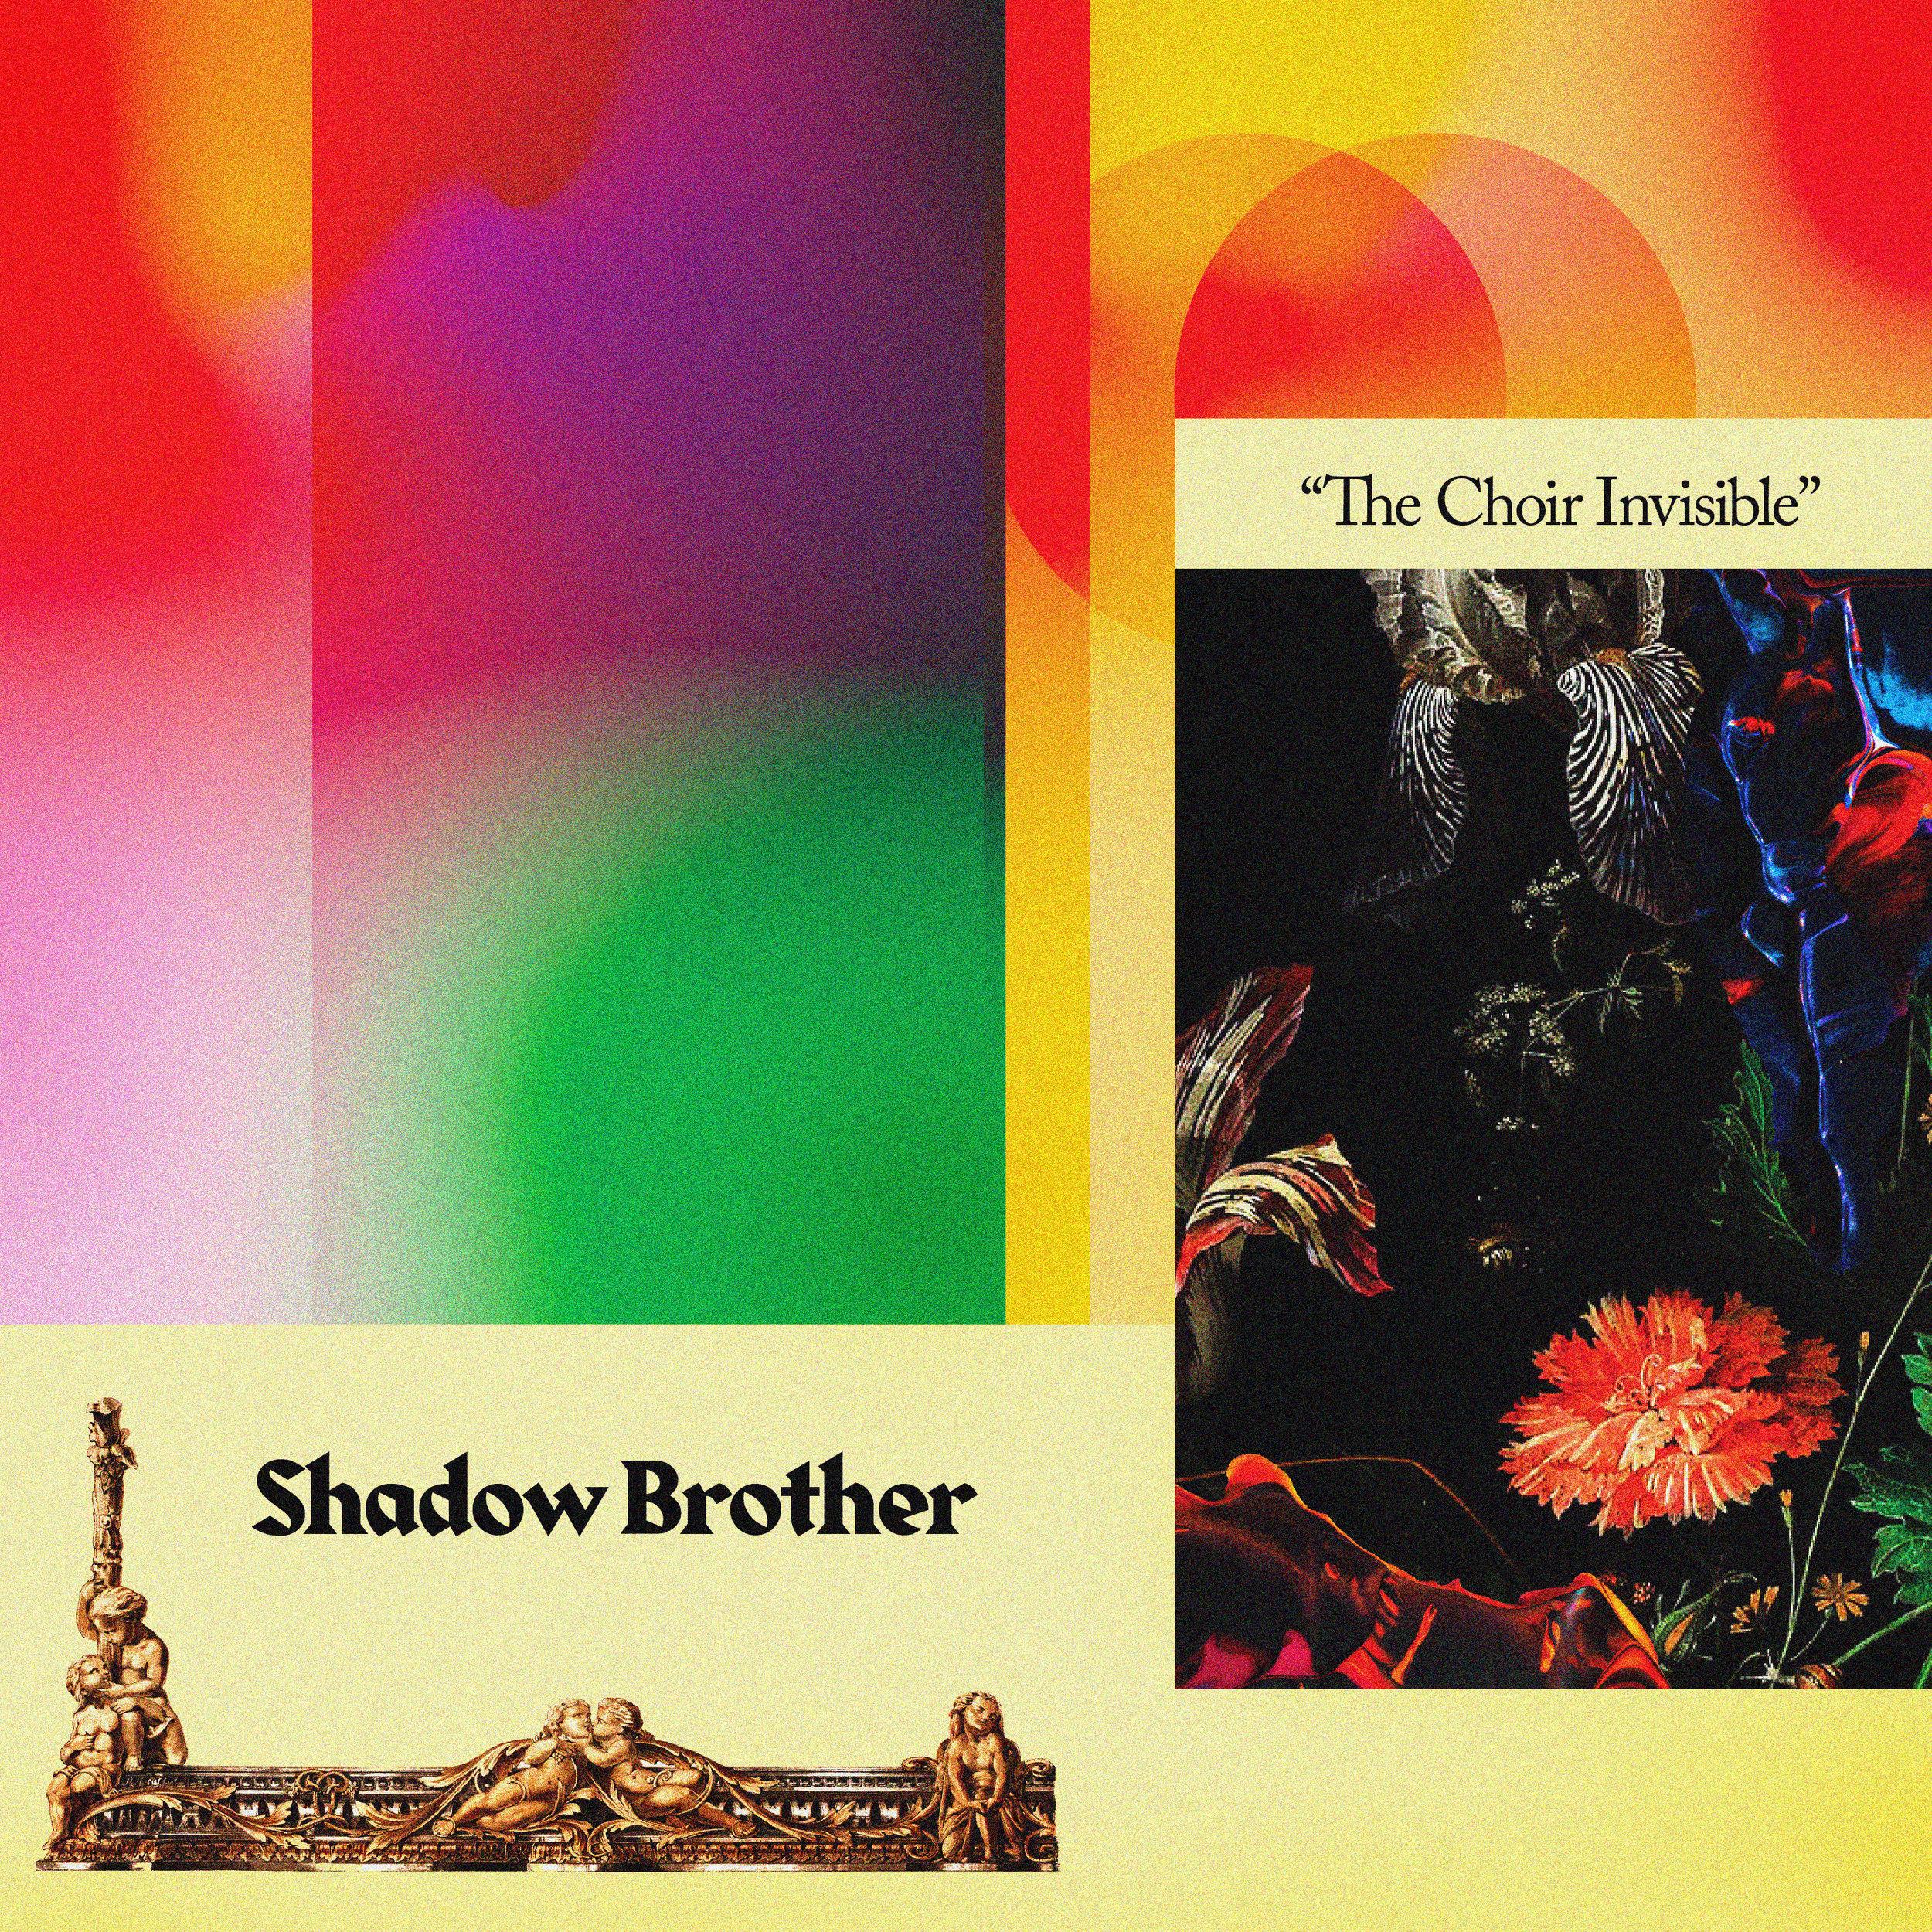 SBRO-TheChoirInvisible-Single-3K.jpg